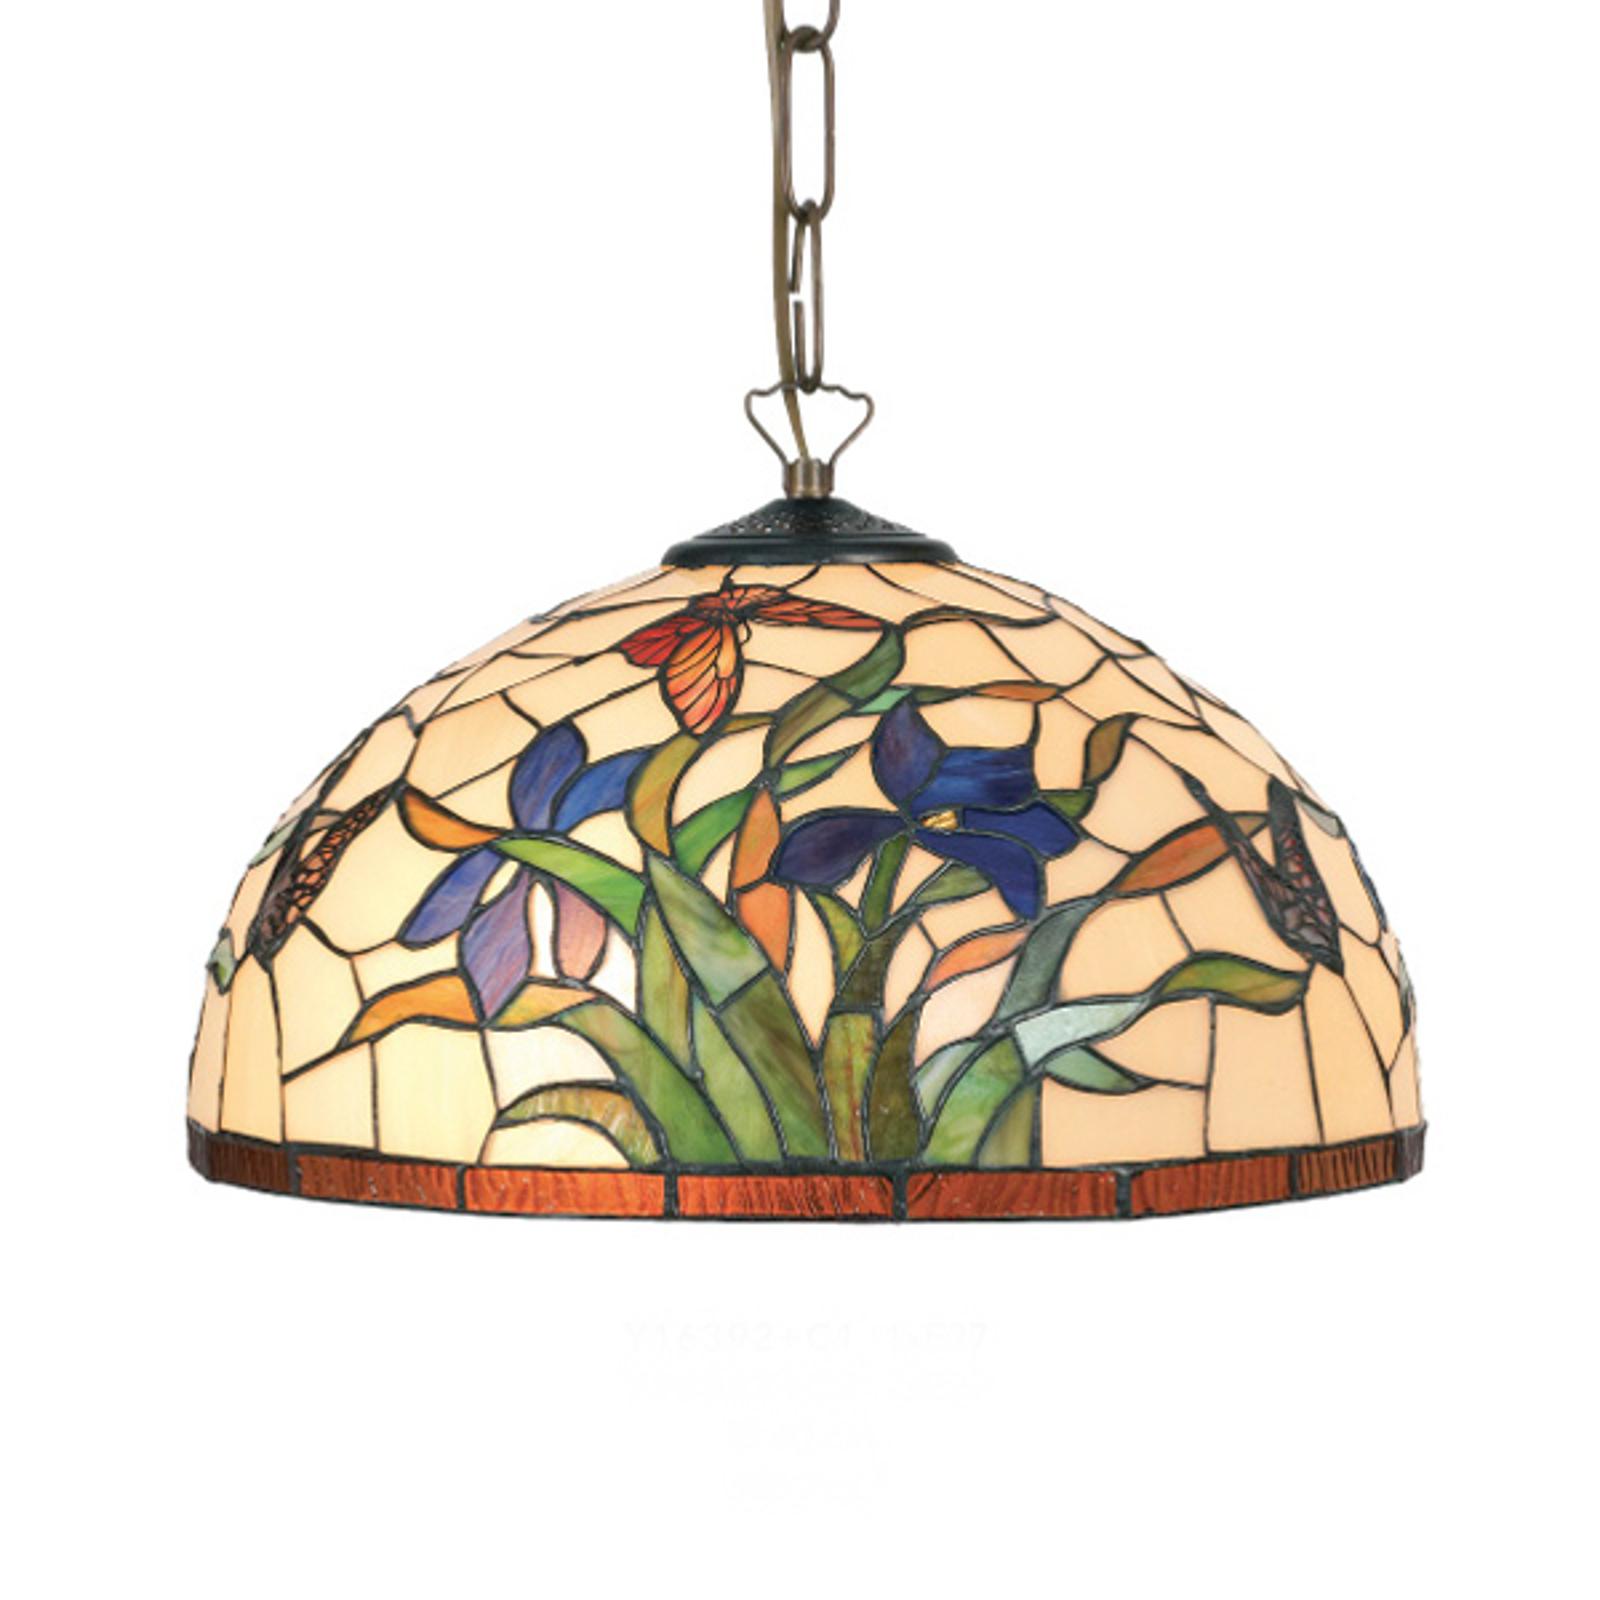 Hanglamp Elanda in Tiffany-stijl 1-lichts